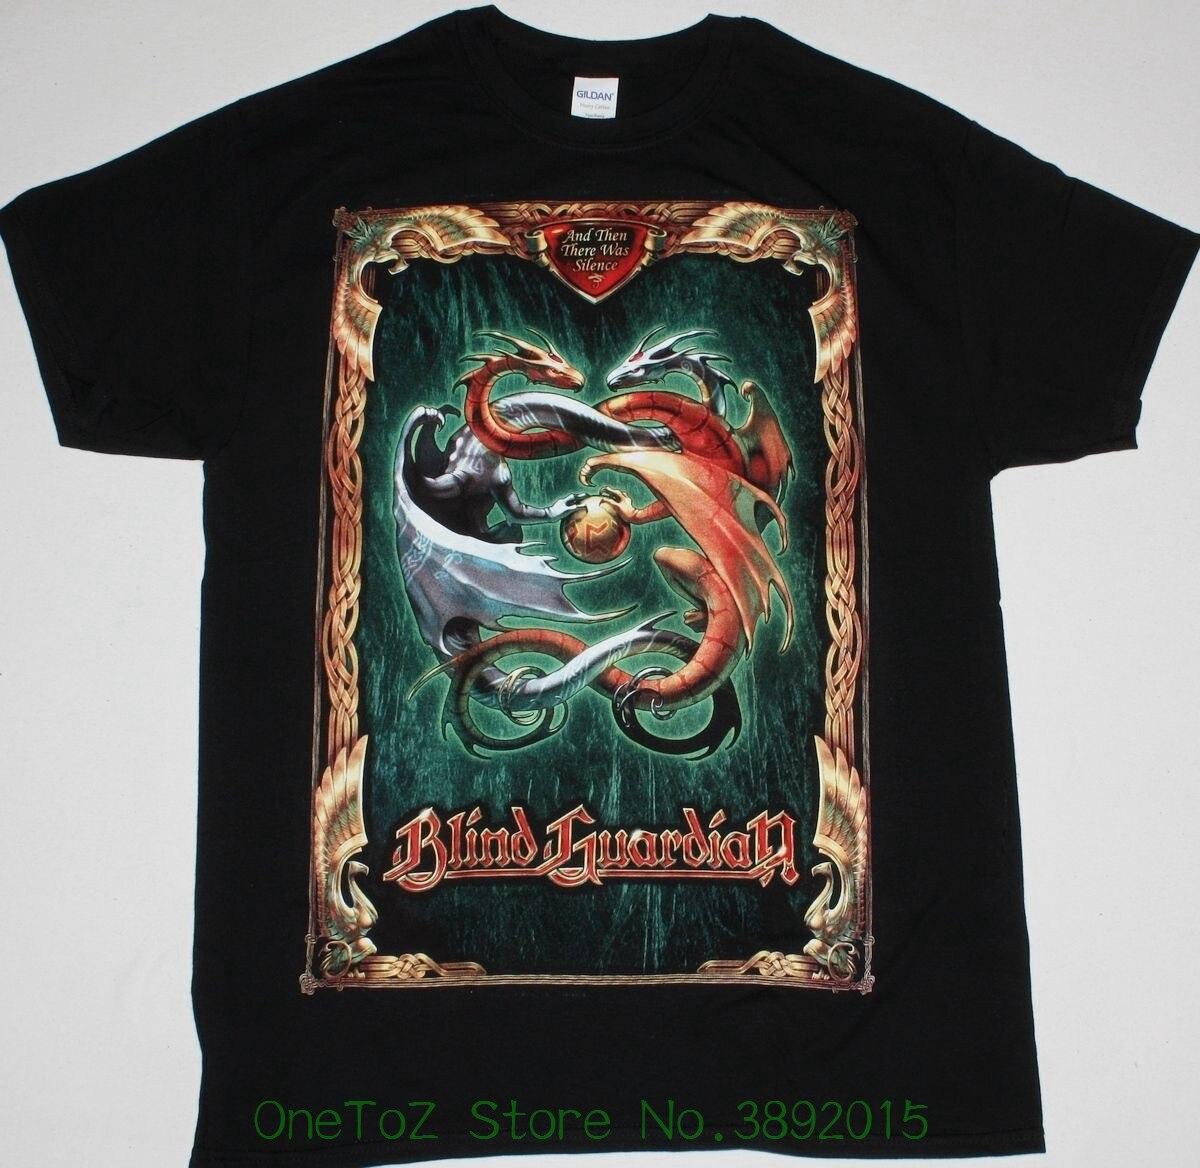 Nueva camiseta de moda para hombre Blind Guard And Then Was Silence gama Ray hellowen nueva camiseta negra